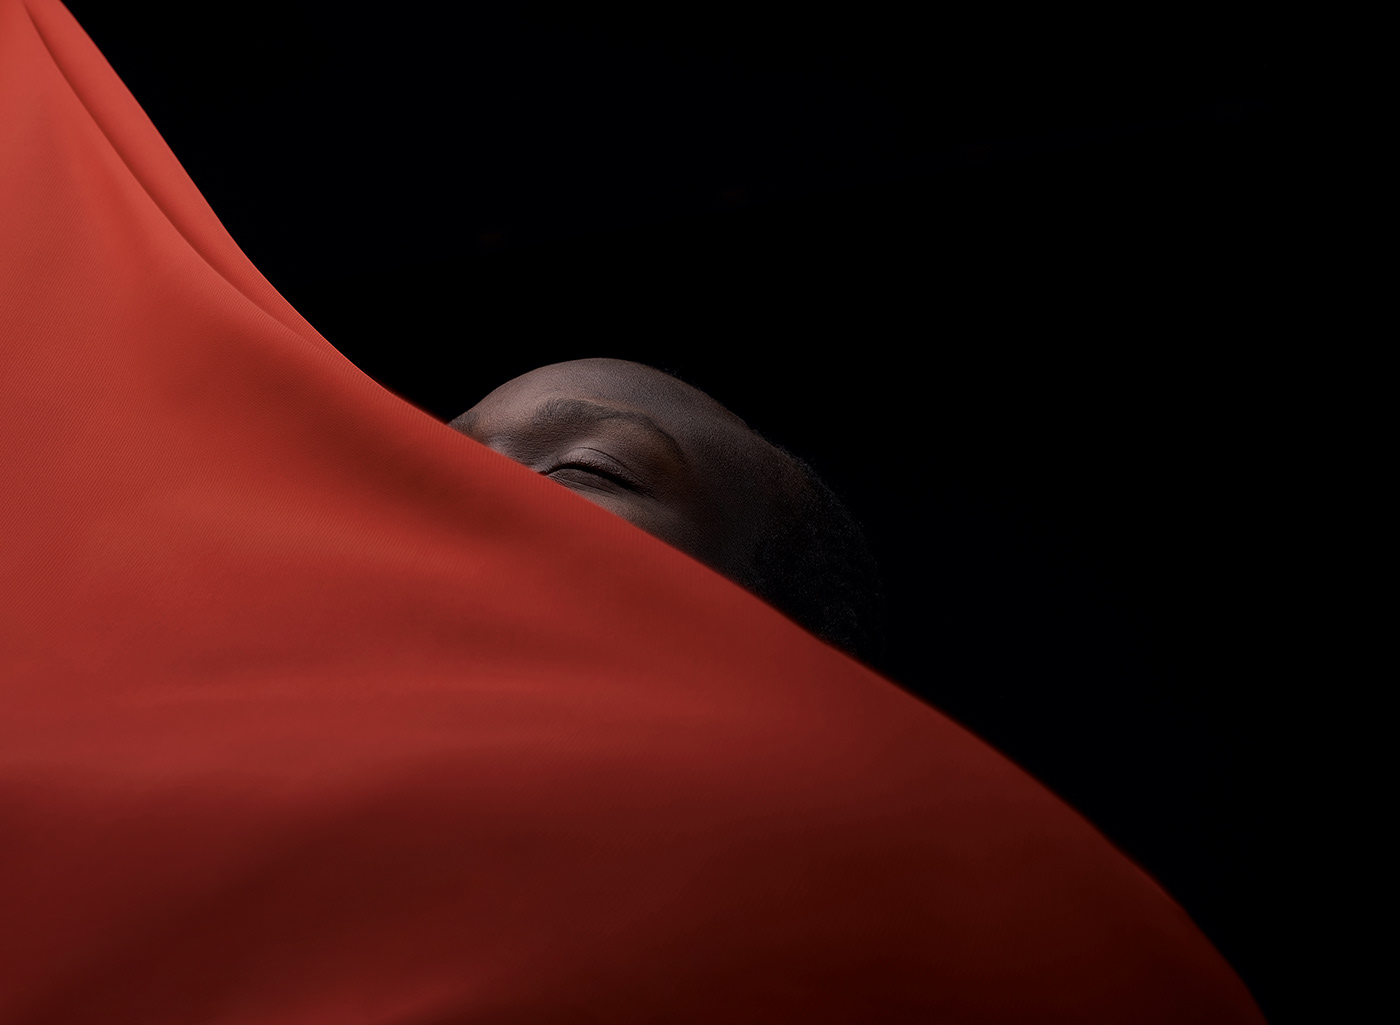 RED / фотограф Jaroslav Monchak